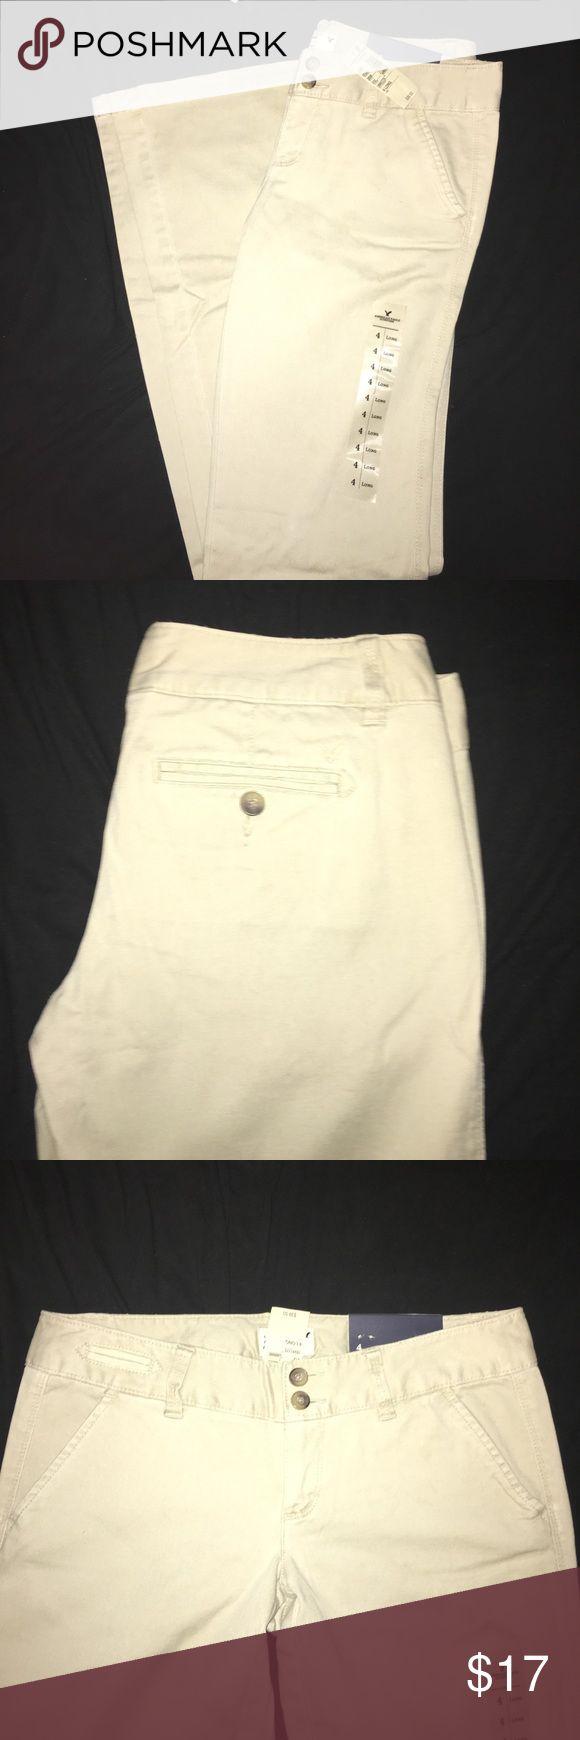 American Eagle Khakis American Eagle khaki pants, style- Artist Trouser, never been worn, tags are on, size 4 Long, wide leg American Eagle Outfitters Pants Wide Leg